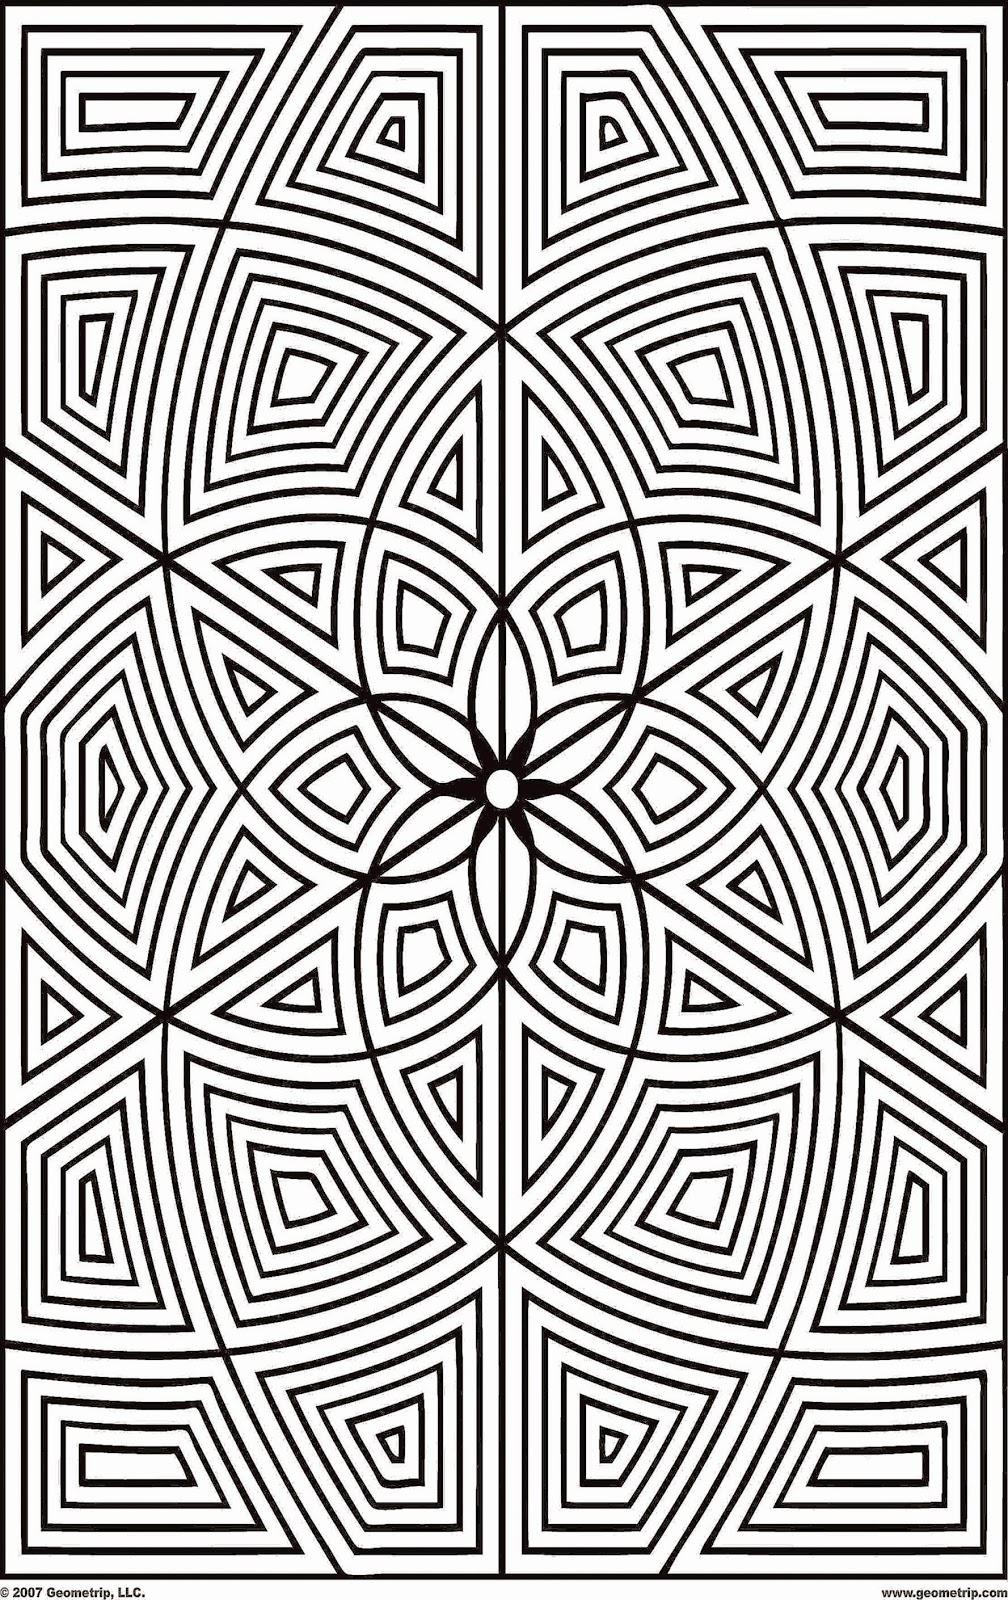 Geometric Coloring Sheets | Free Coloring Sheet